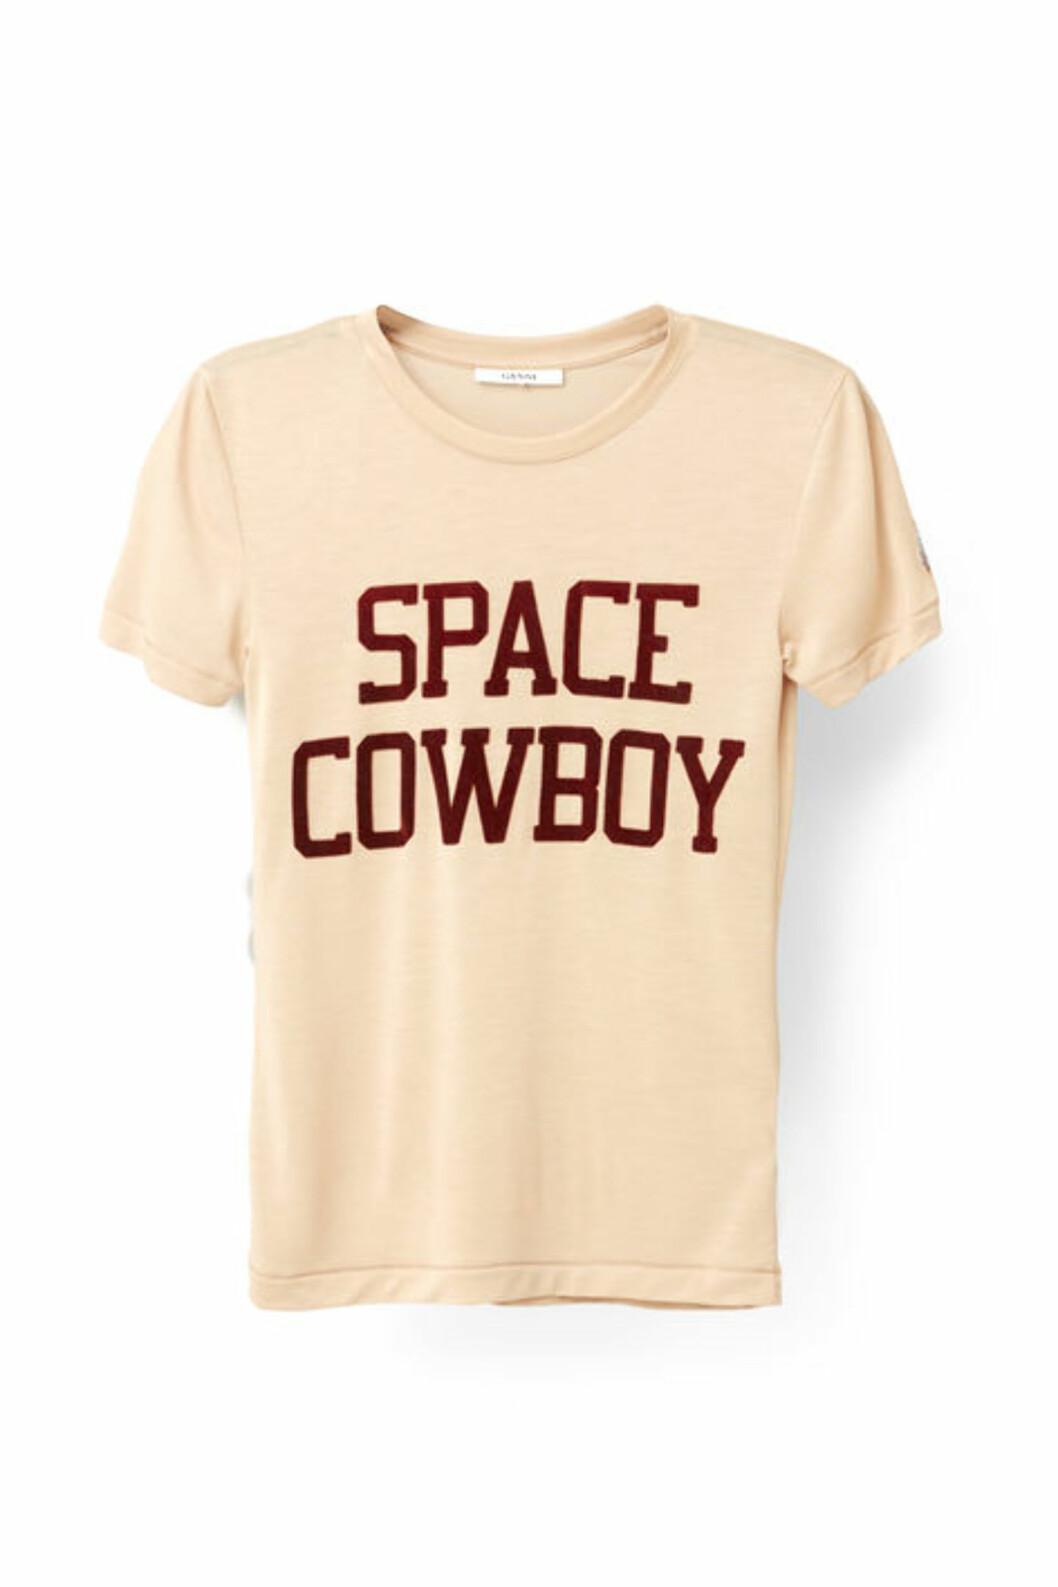 T-skjorte fra Ganni | kr 799 | http://www.ganni.com/shop/tops-and-t-shirts/linfield-lyocell-t-shirt%2C-space-cowboy/T1797.html?dwvar_T1797_color=Cuban%20Sand